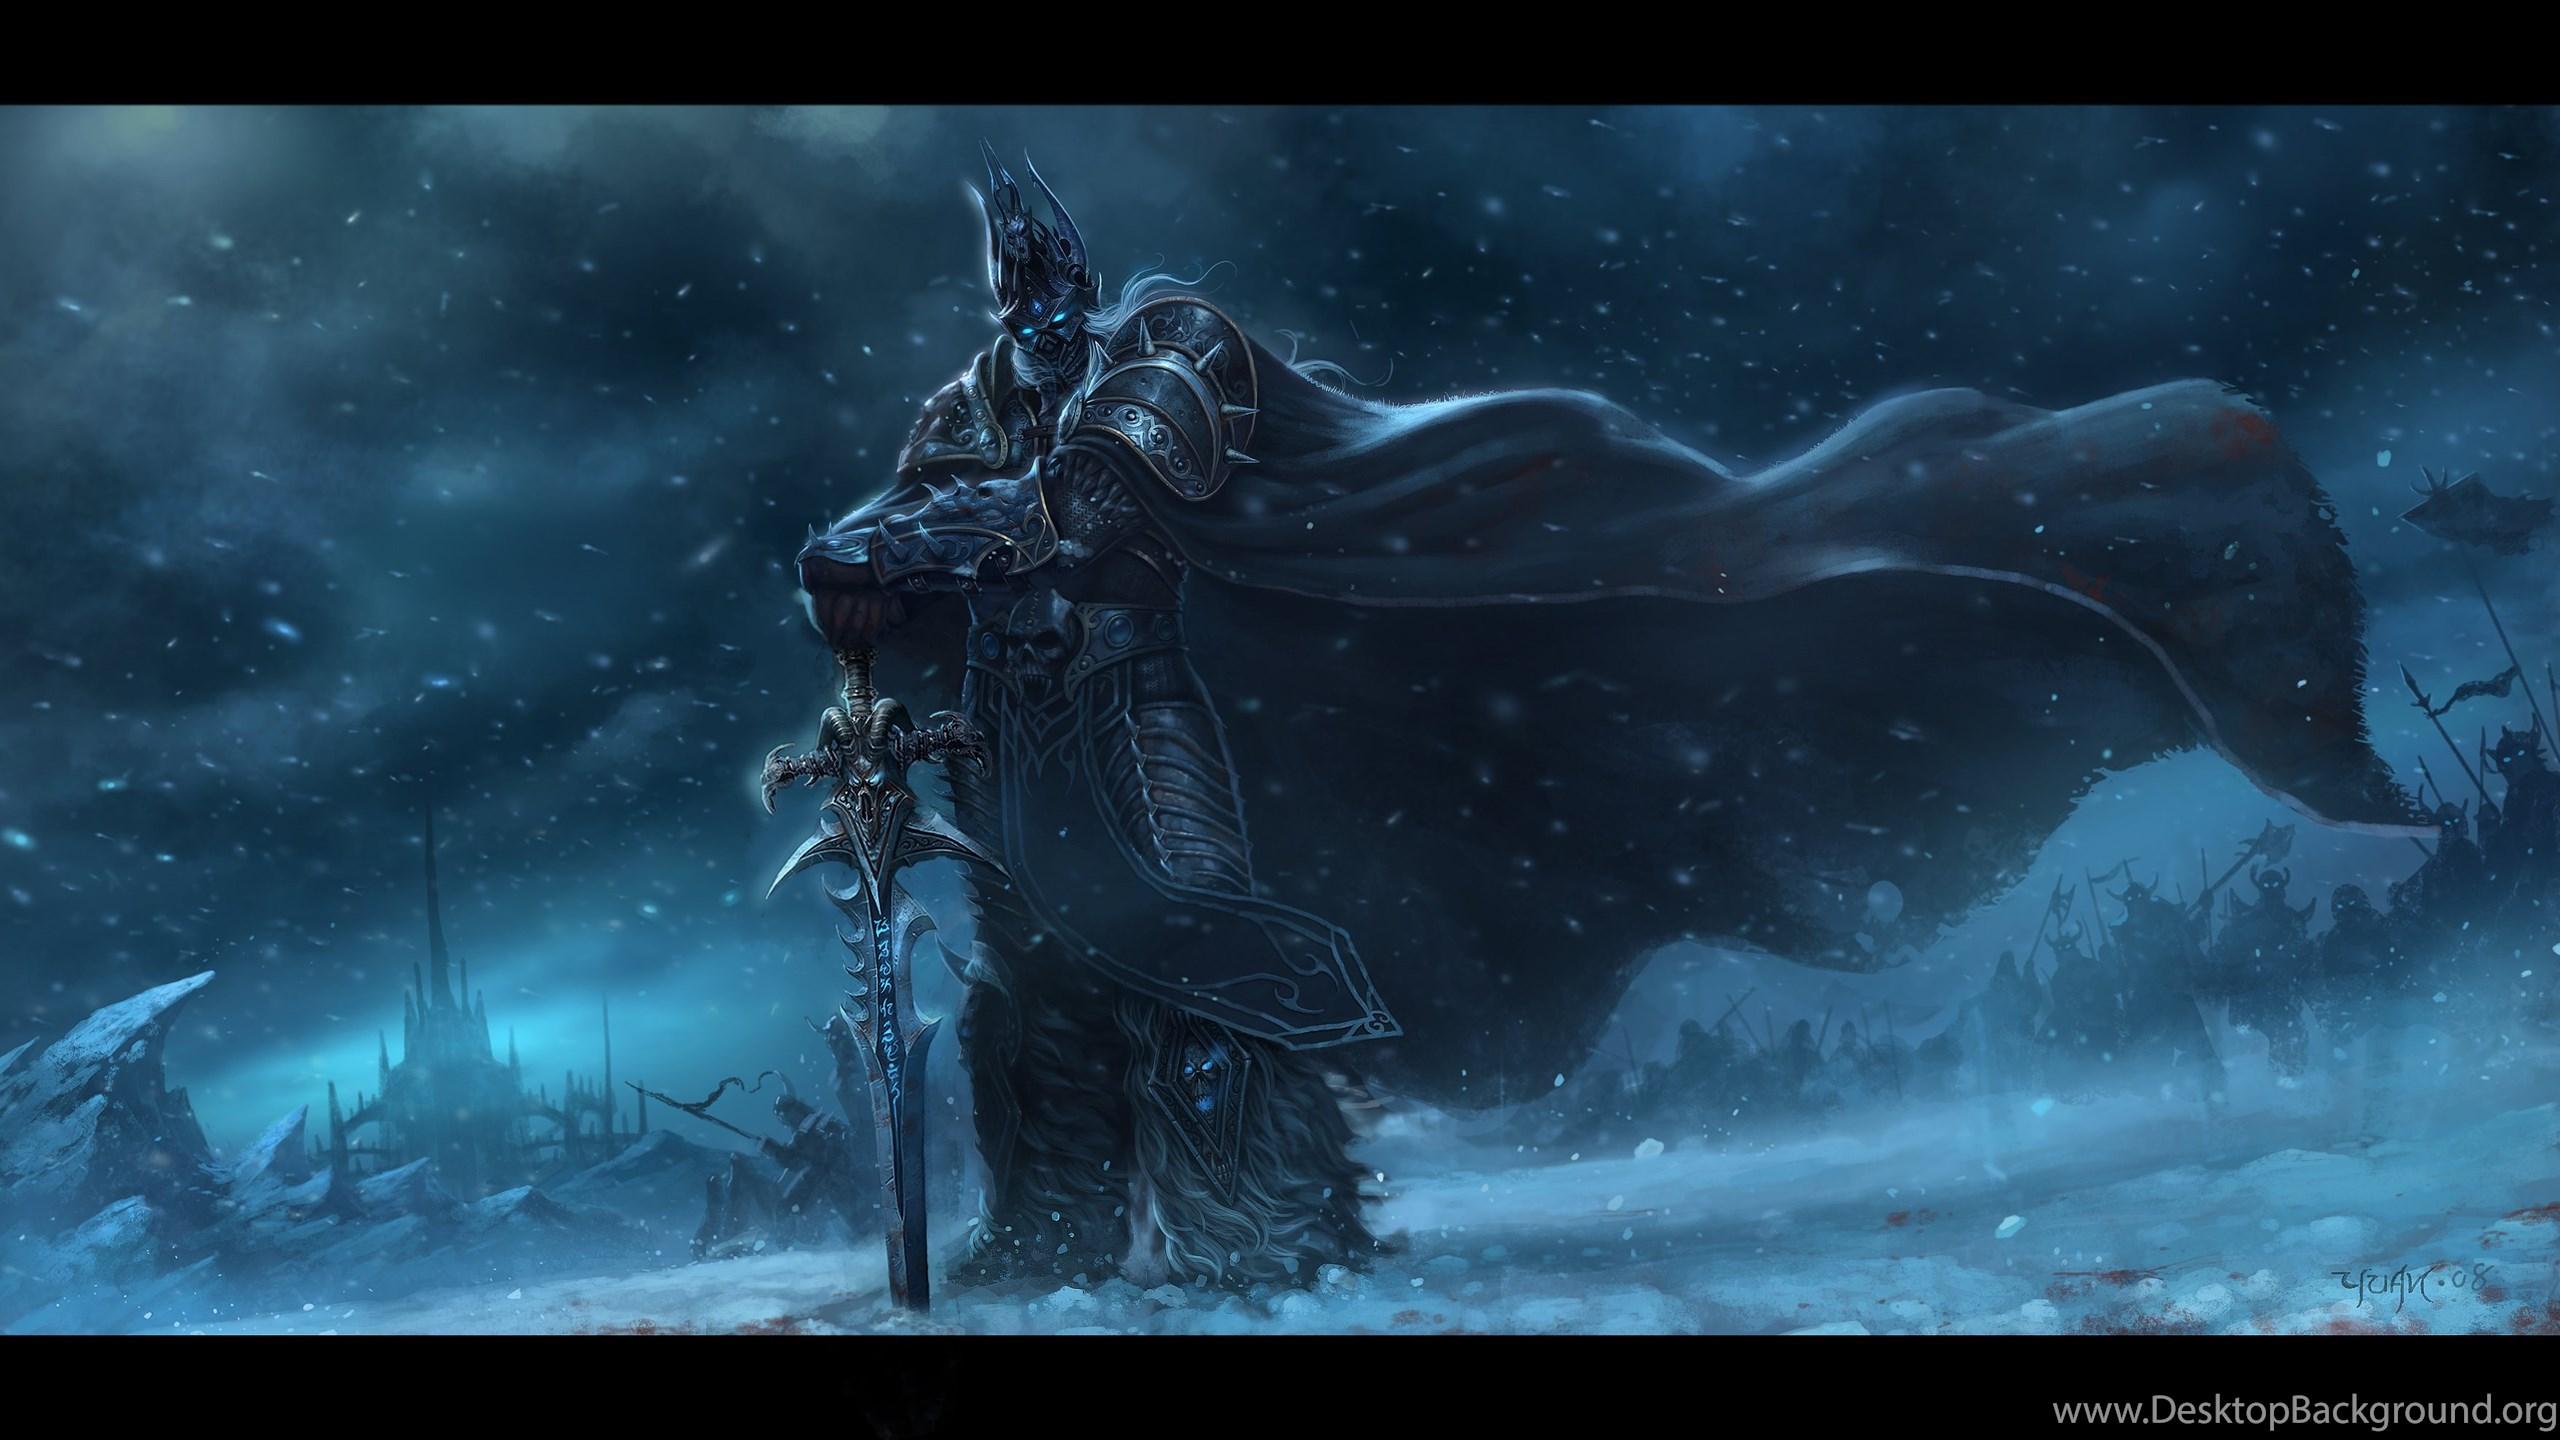 Arthas Menethil, The Lich King By ChaoyuanXu On DeviantArt